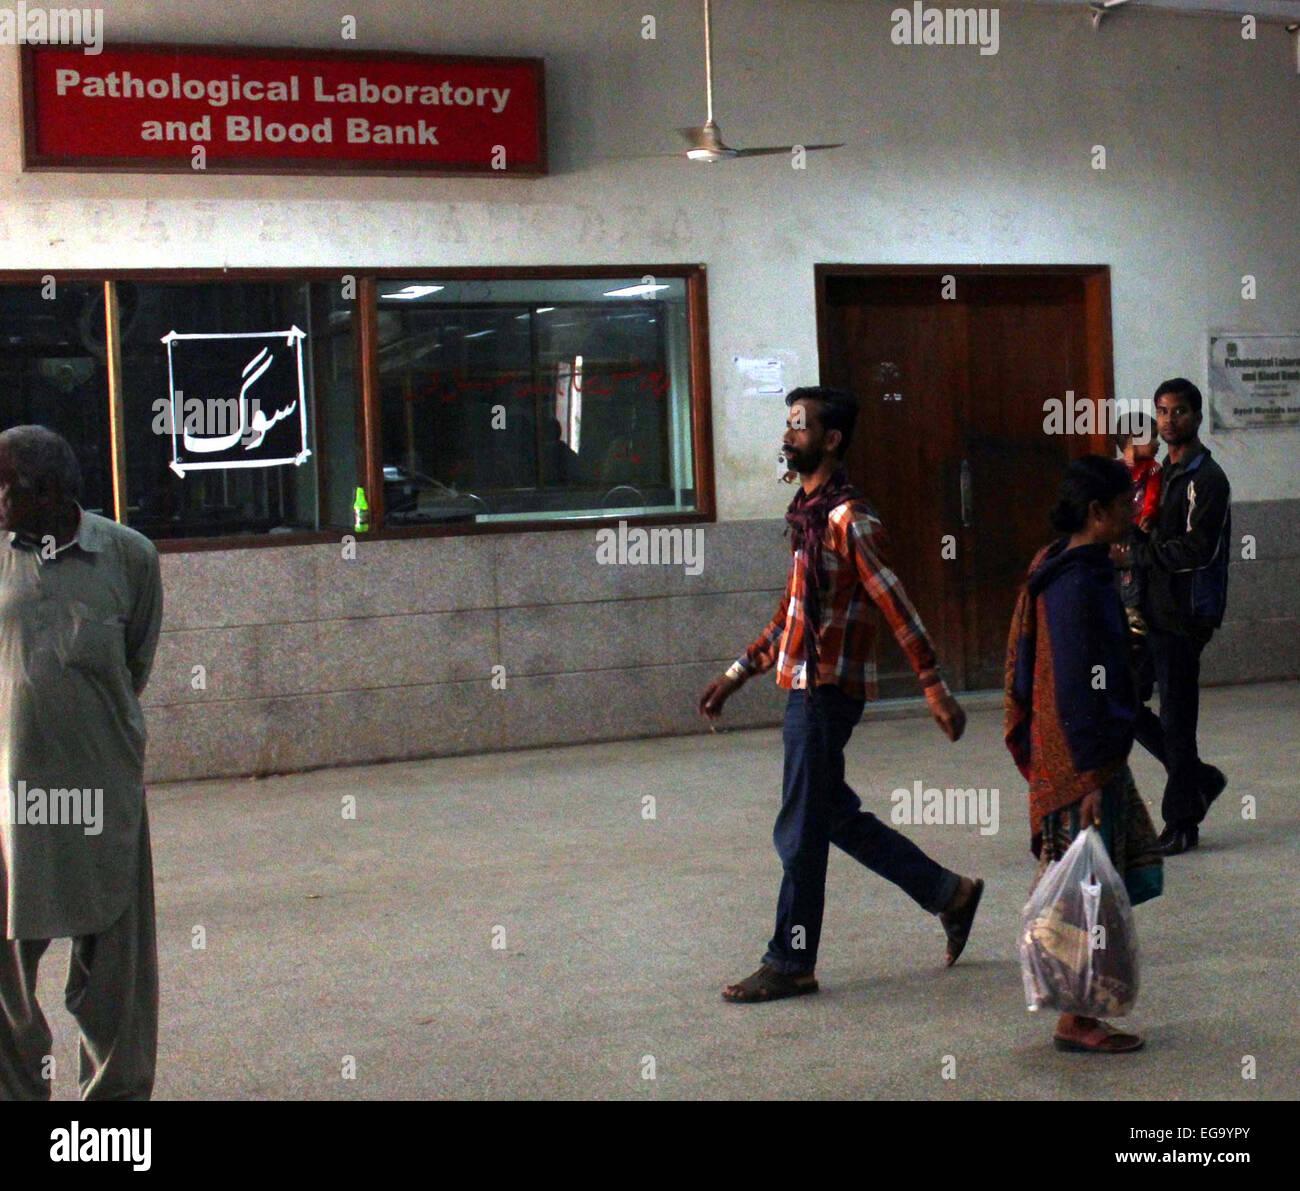 Karachi, Pakistan. 20th Feb, 2015. Pathological Laboratory and Blood Bank at Abbasi Shaheed Hospital (ASH) is closed - Stock Image